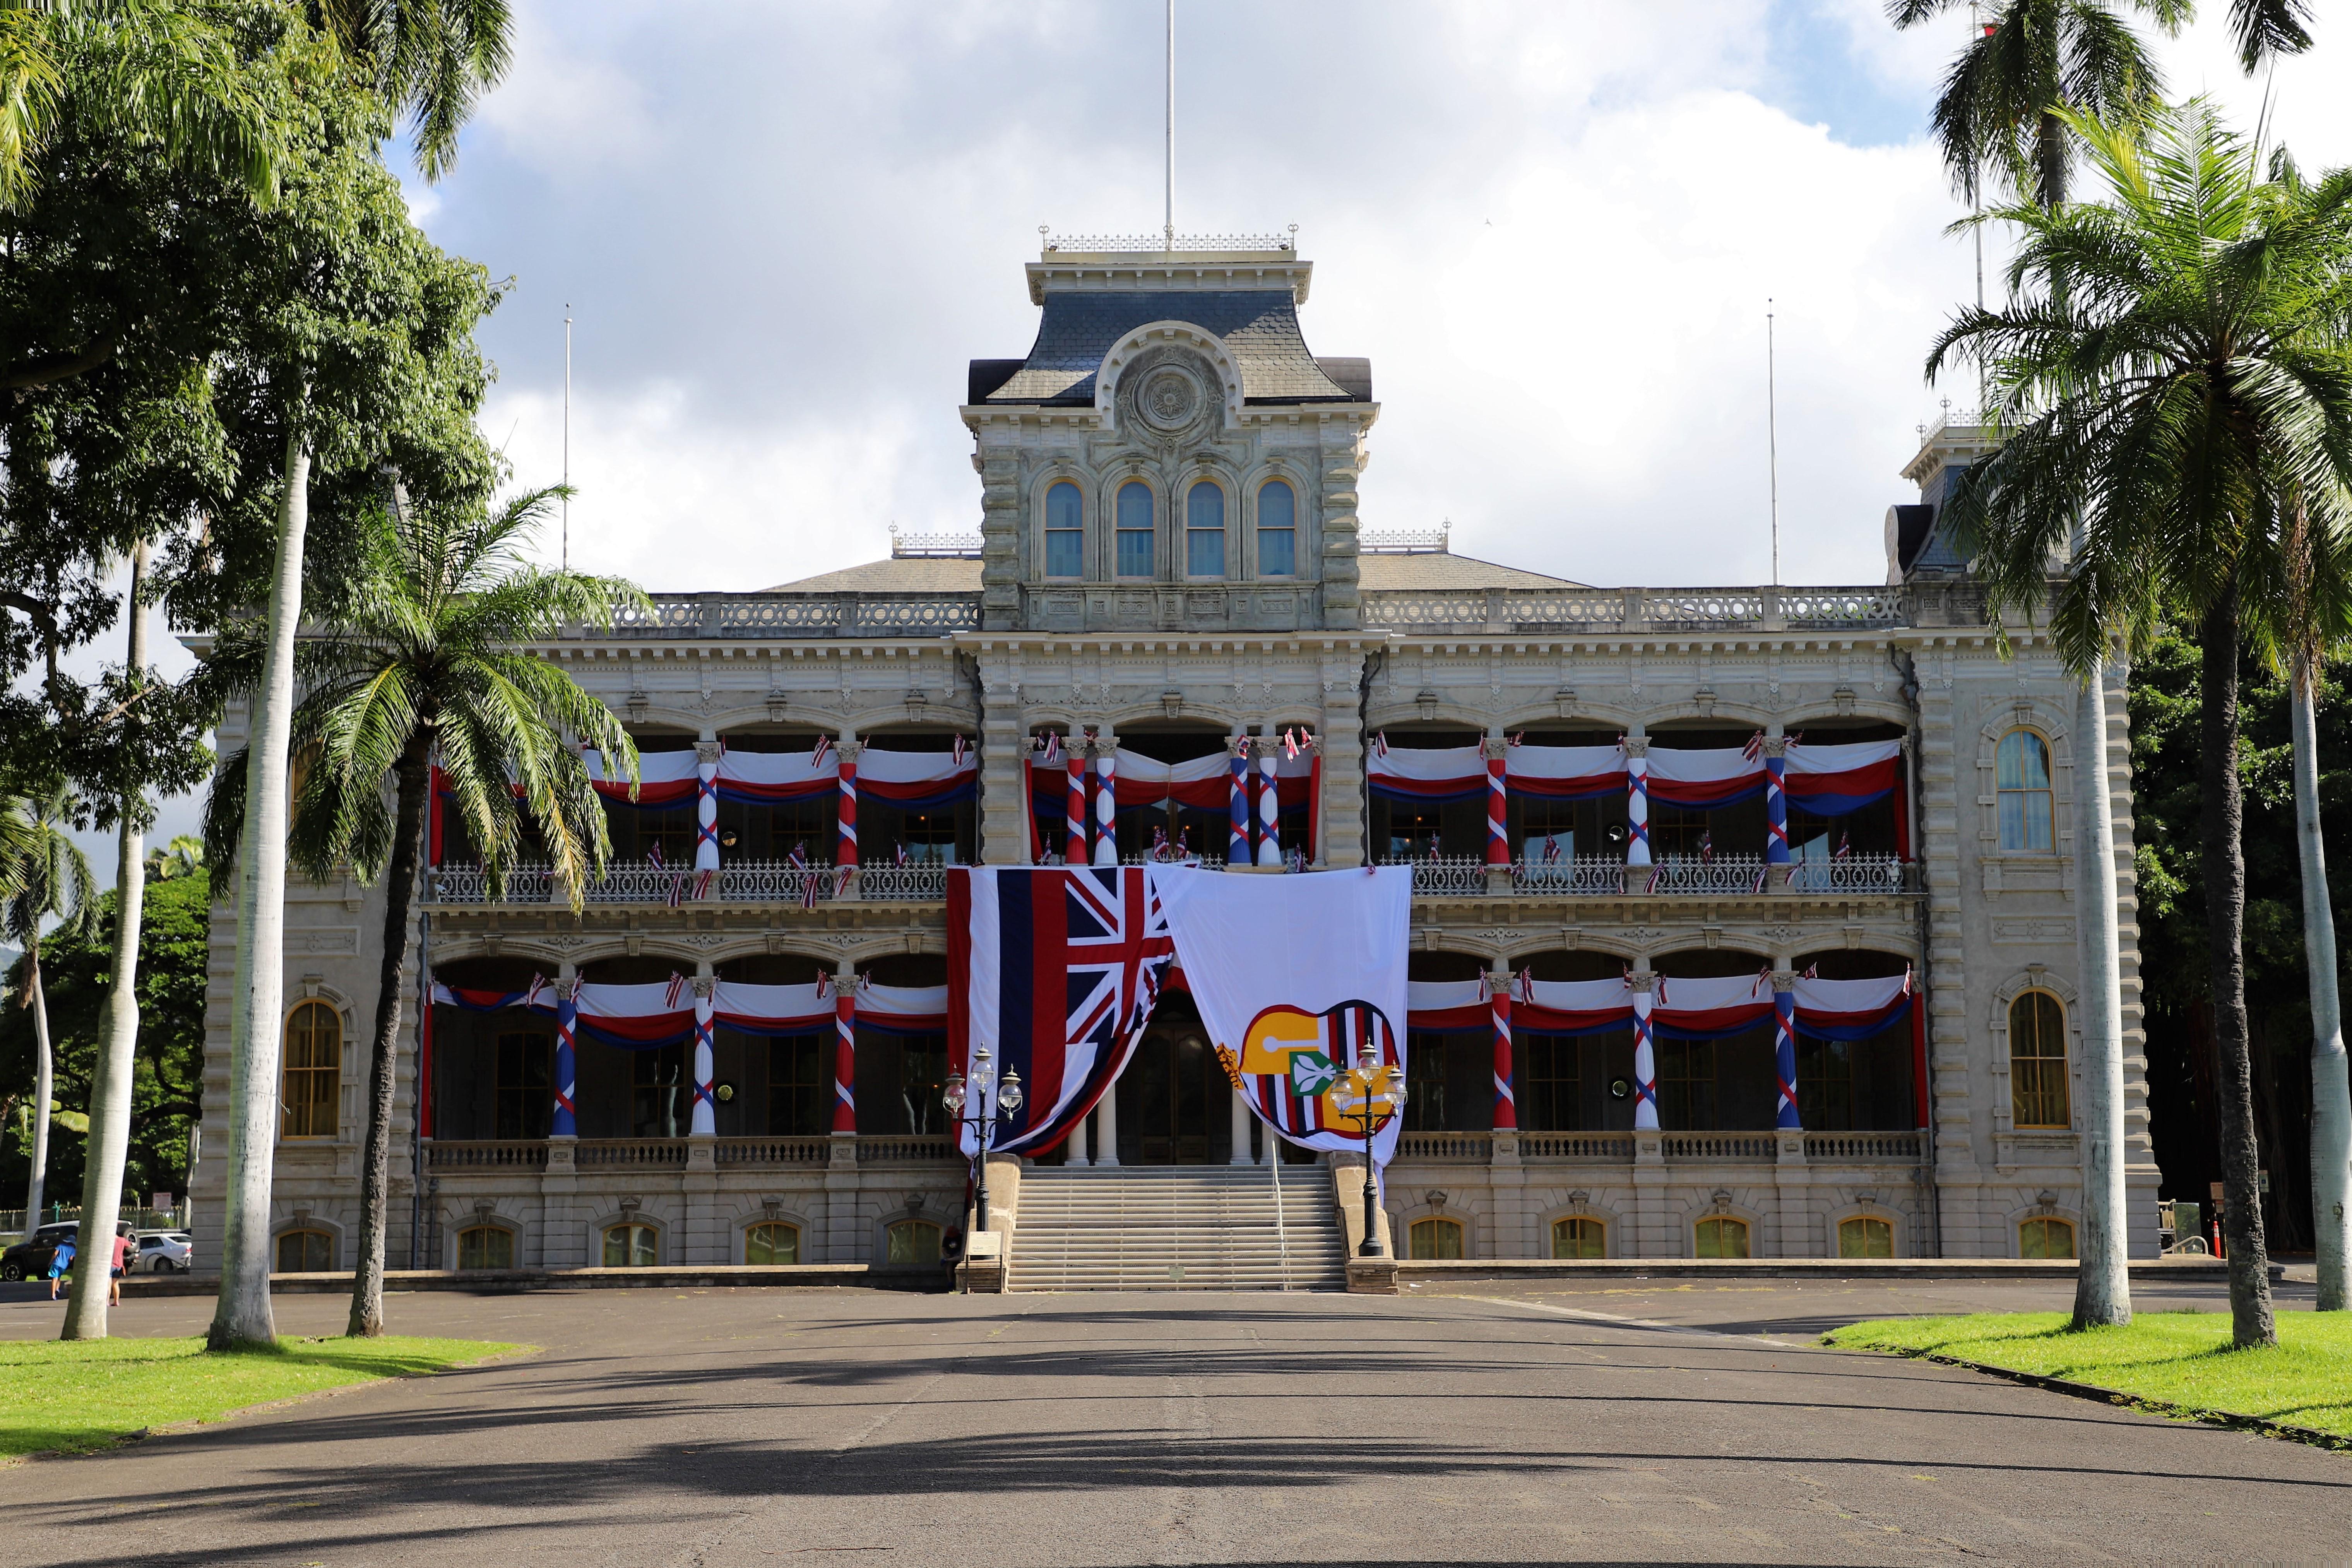 2018 11 12 85 Honolulu Iolani Palace.JPG